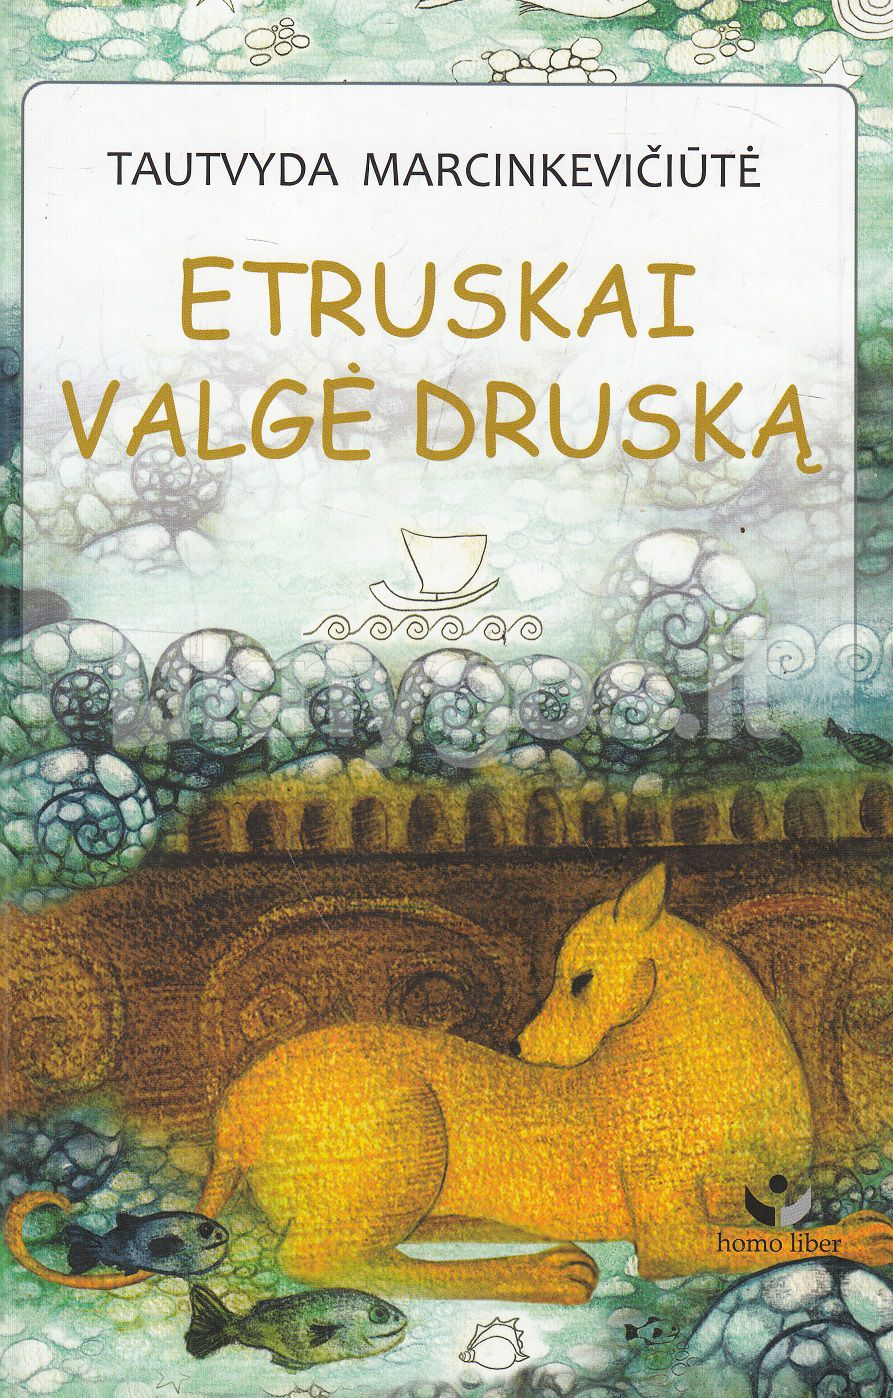 "Tautvyda Marcinkevičiūtė ""Etruskai valgė druską"" (Vilnius: Homo liber, 2013)"